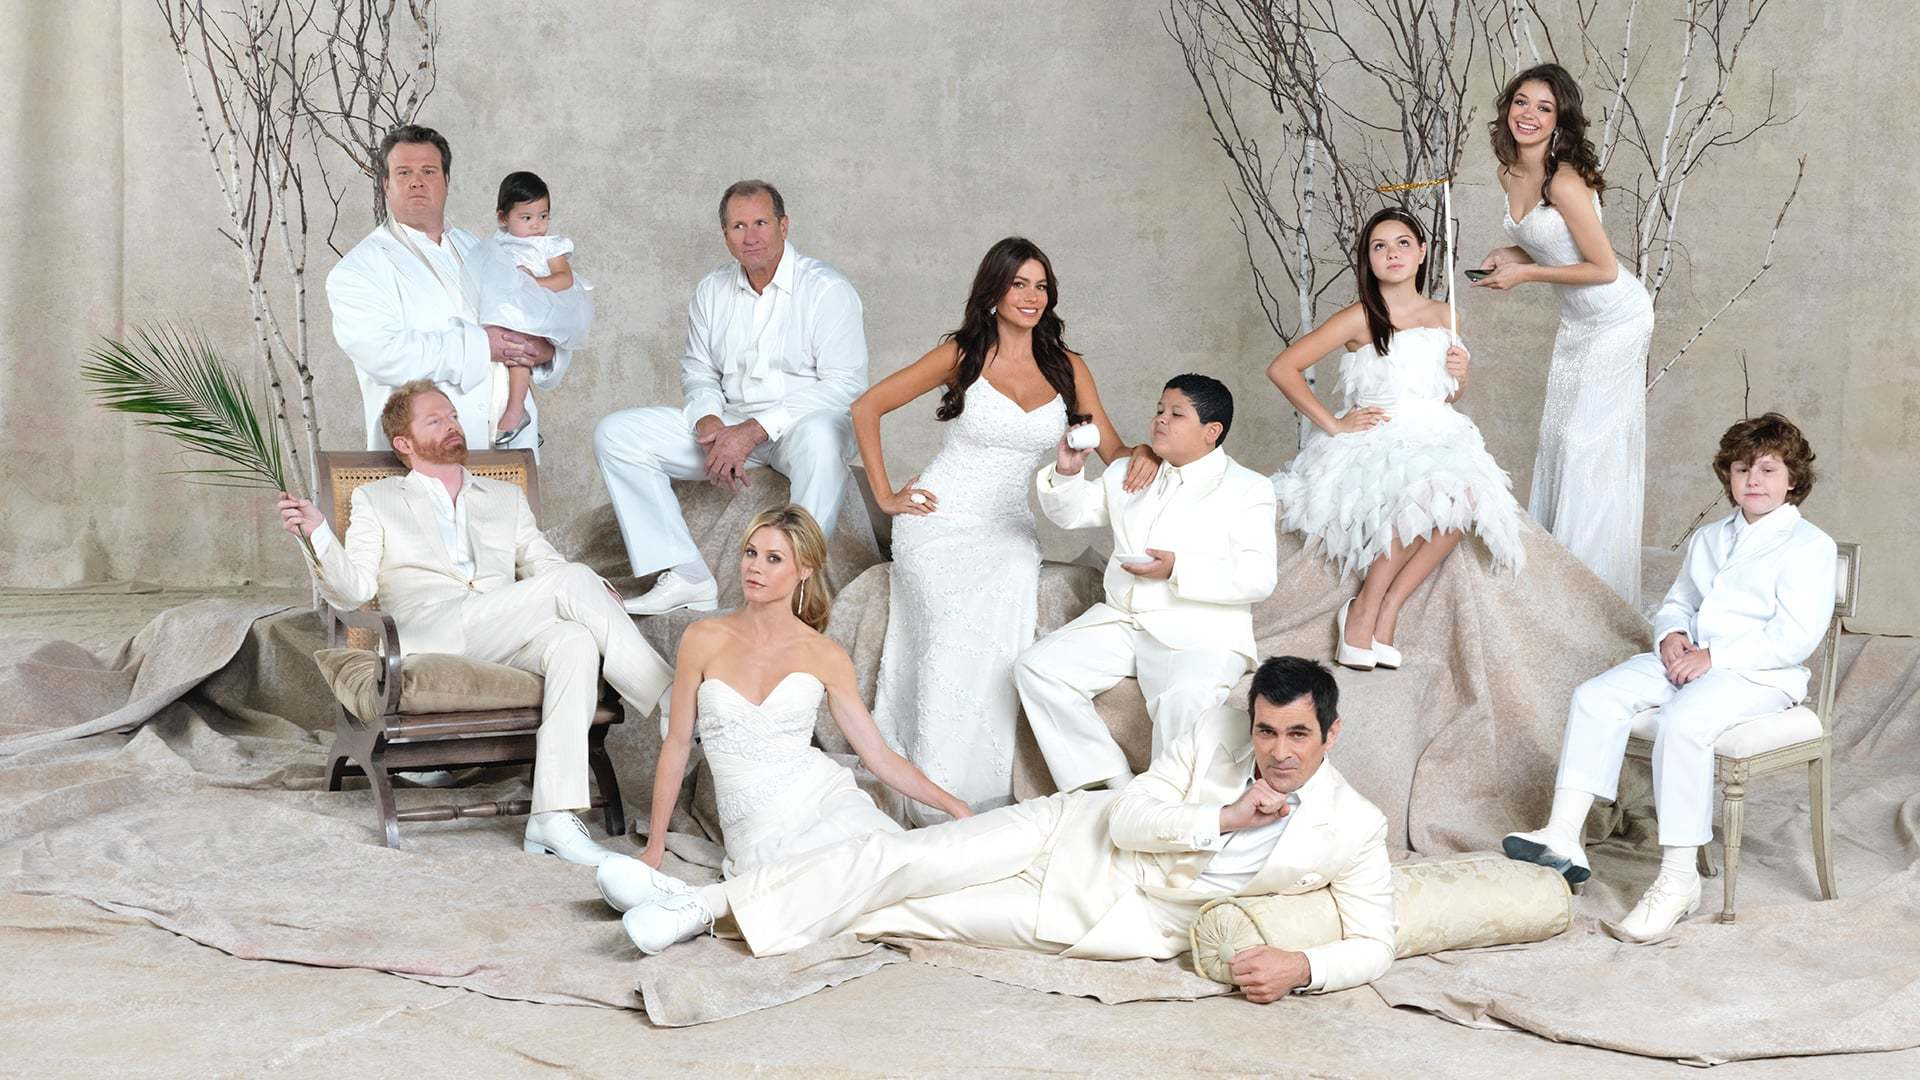 Кадры из фильма Американская семейка Modern Family 2009